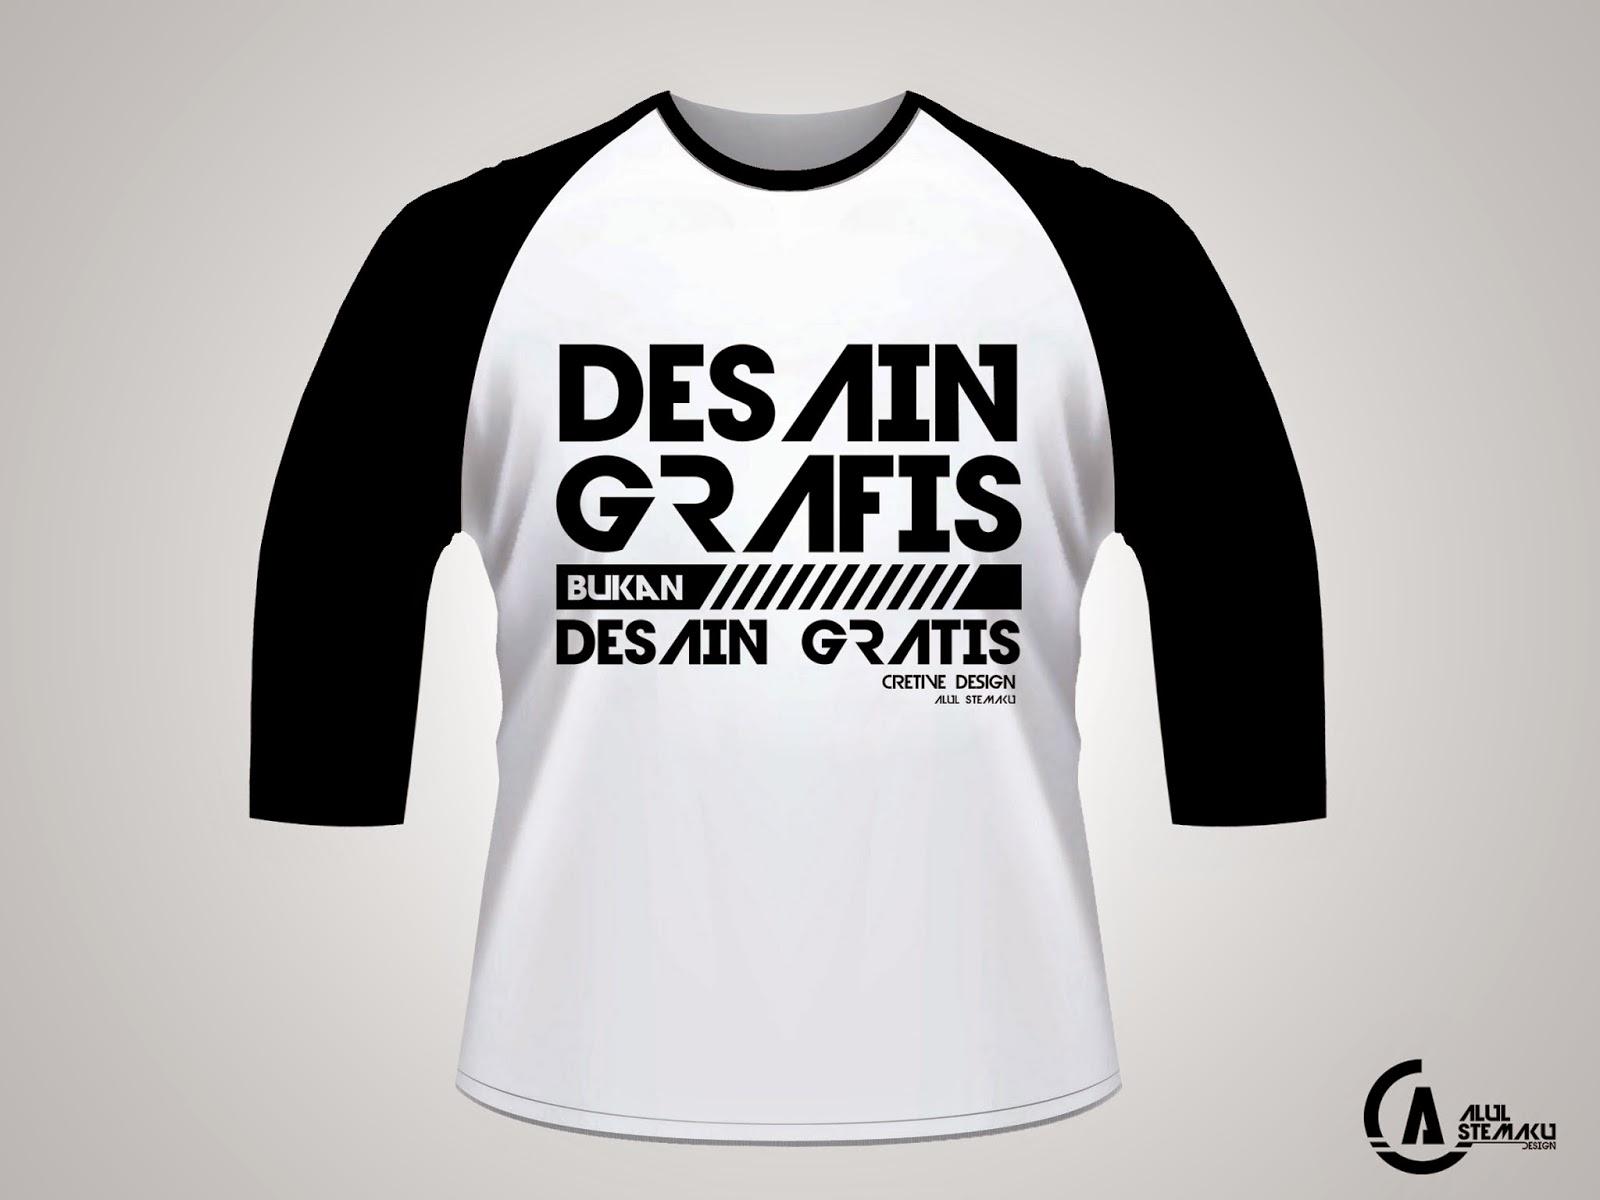 Download Gambar Desain Kaos Lengan 3 4 PSD